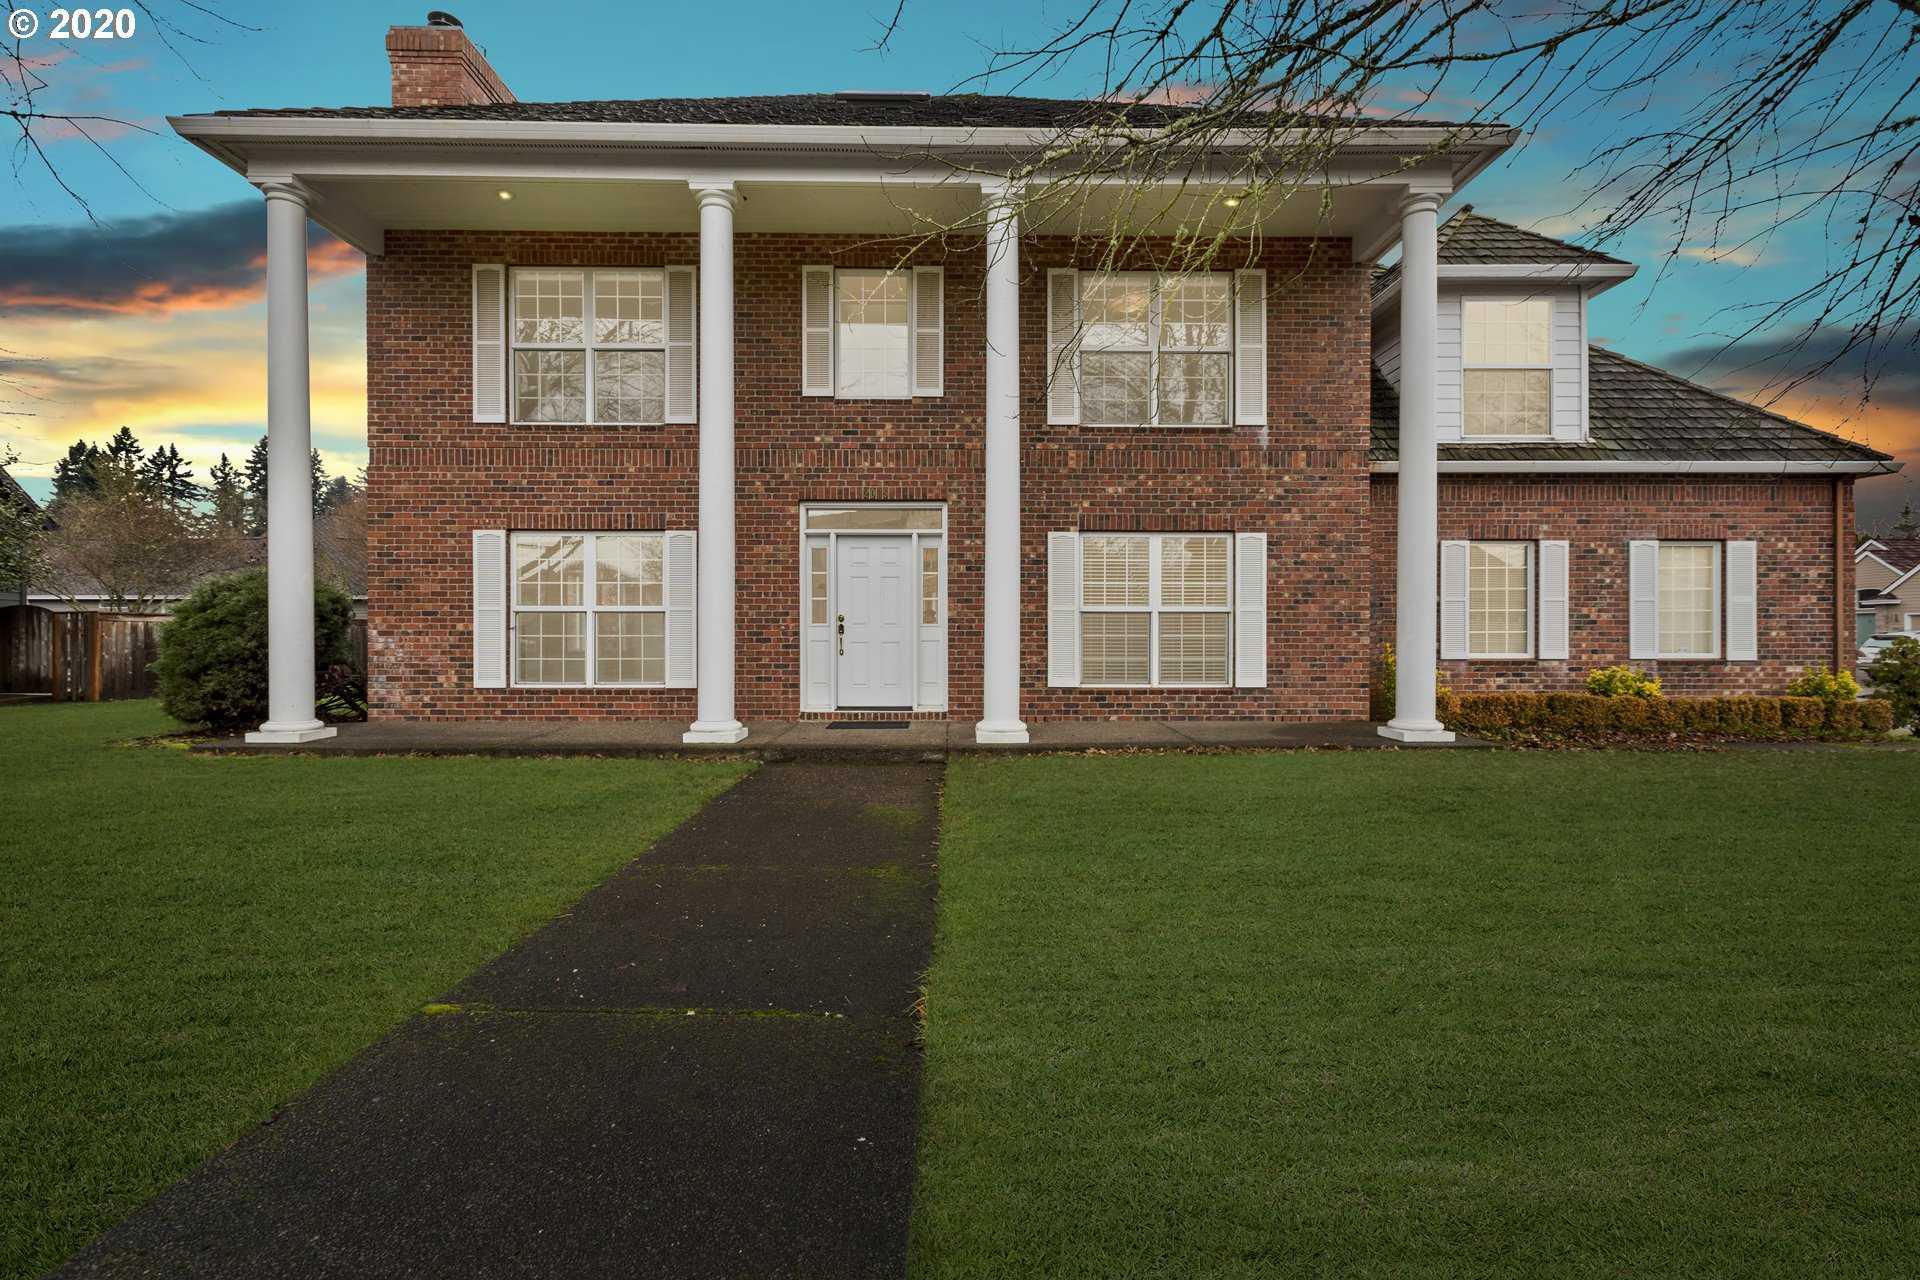 $950,000 - 3Br/3Ba -  for Sale in Wilsonville